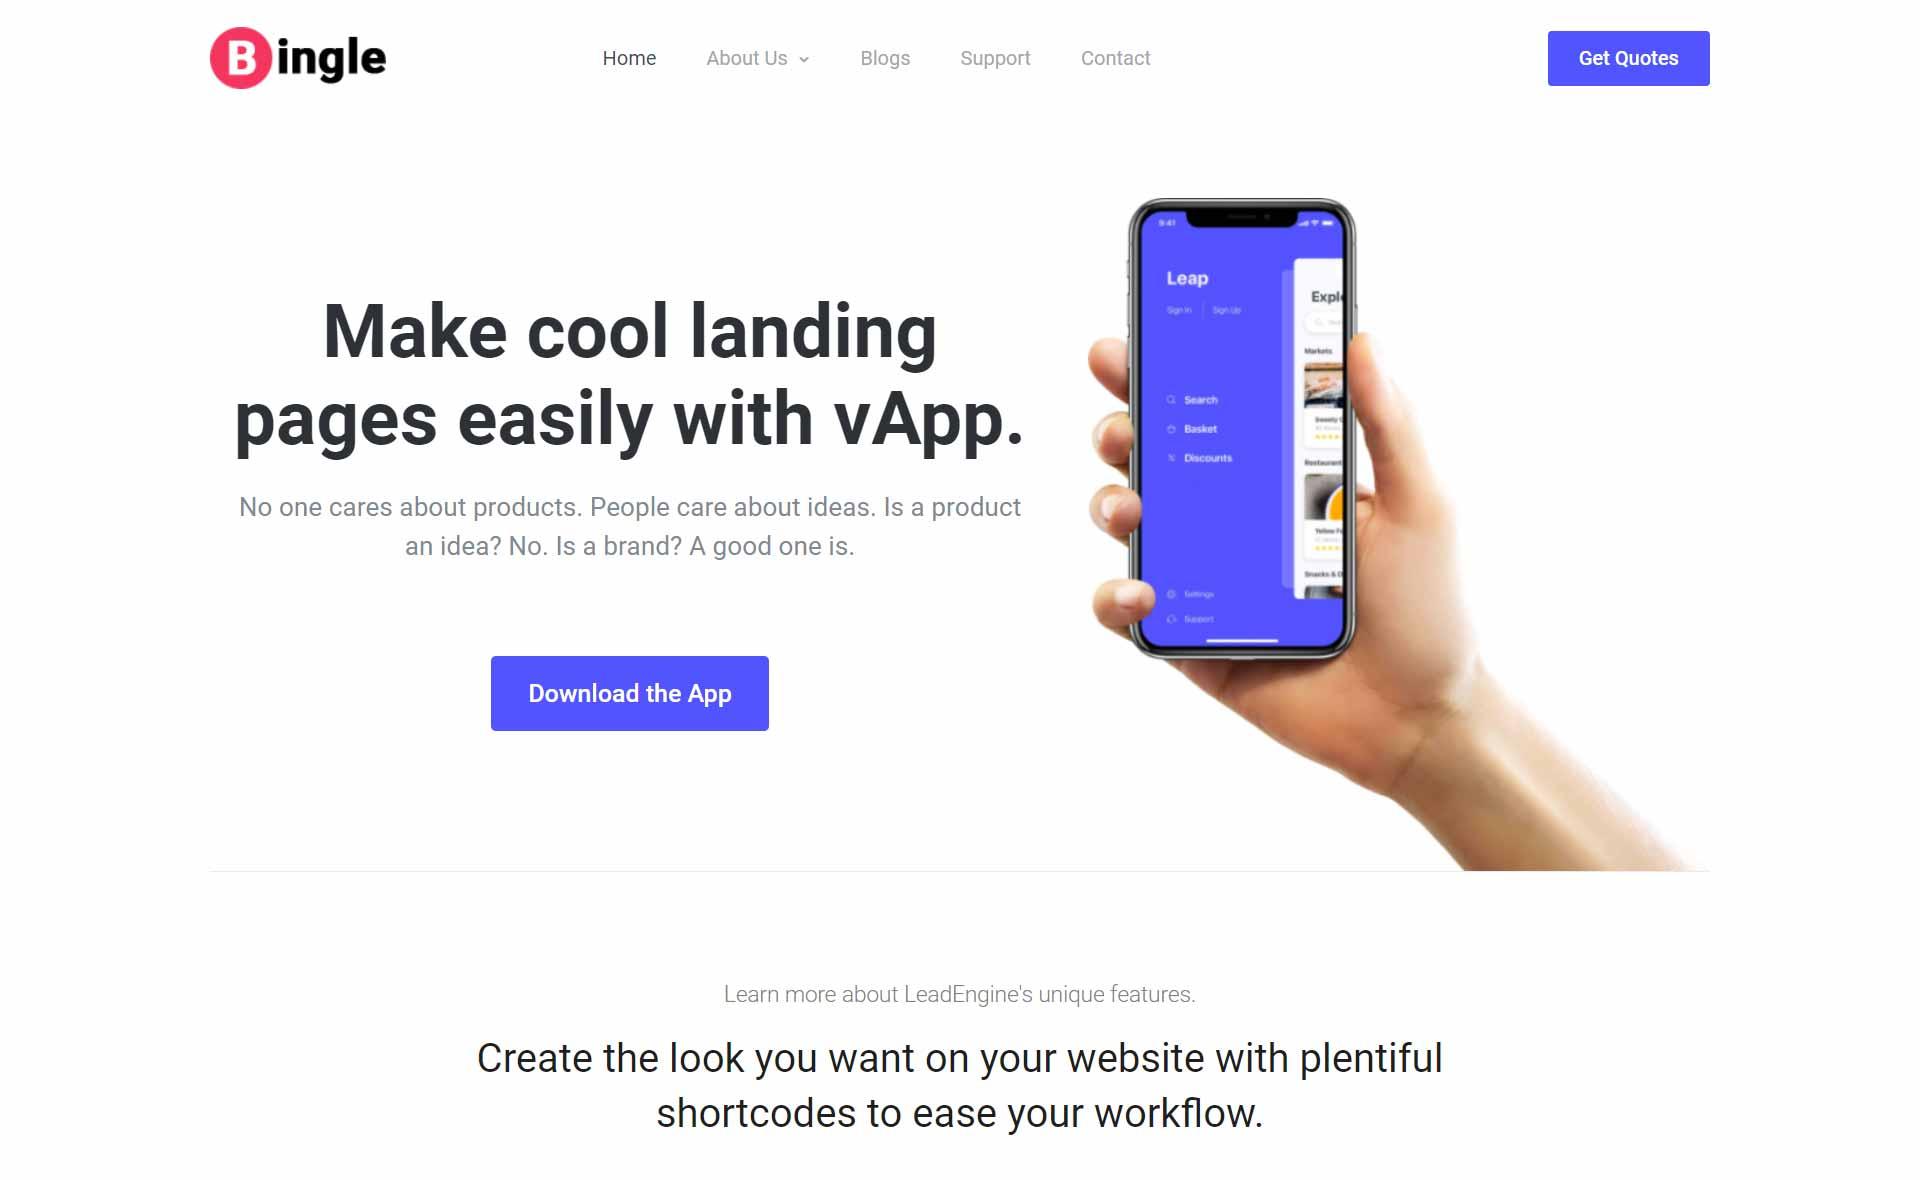 bingle-blog-free-responsive-theme